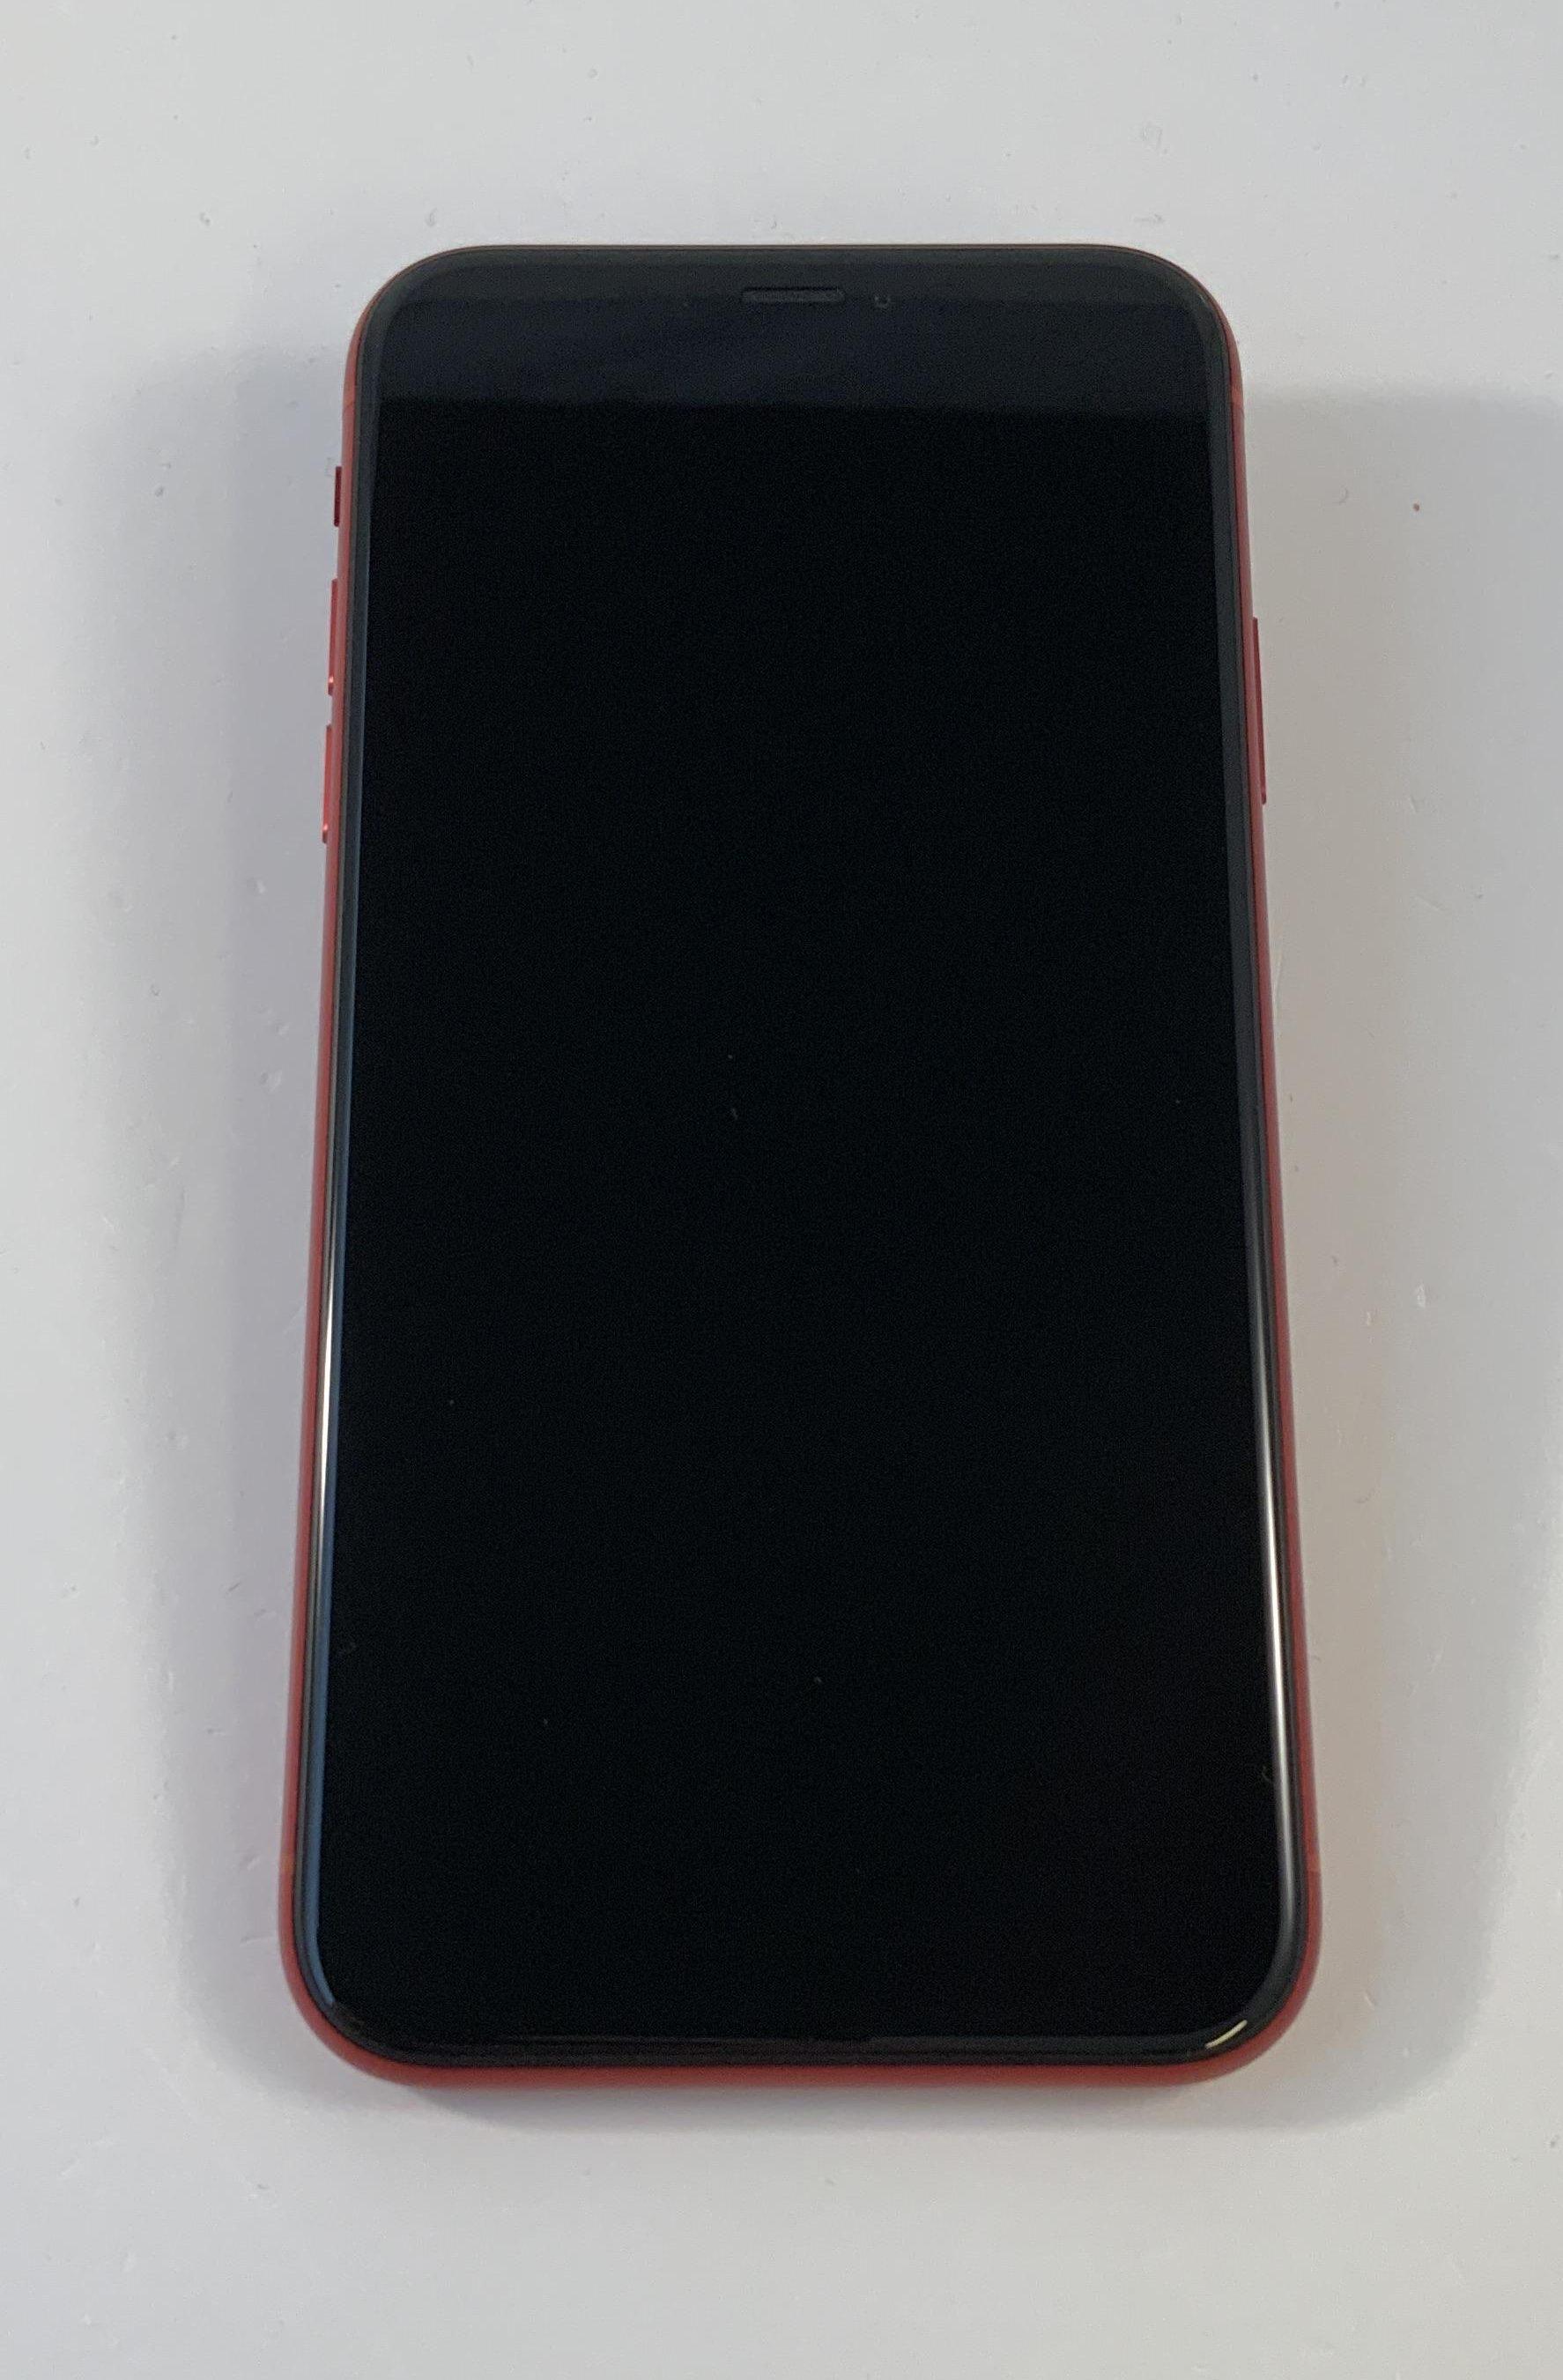 iPhone XR 128GB, 128GB, Red, immagine 1